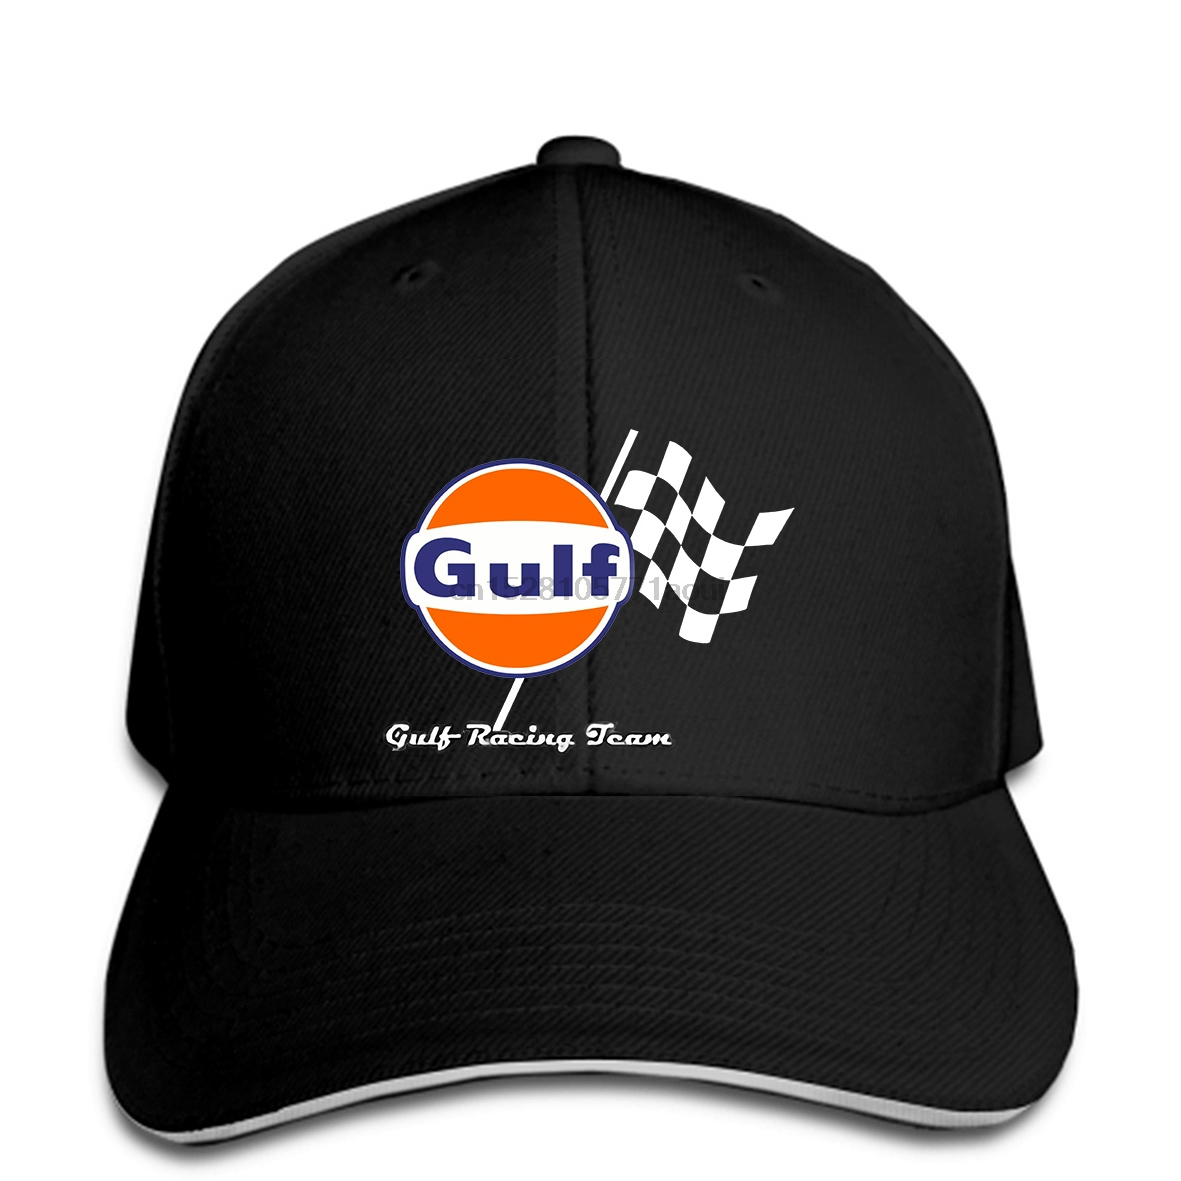 Baseball cap Vintage Gulf Racing Team Men's Grey Baseball caps